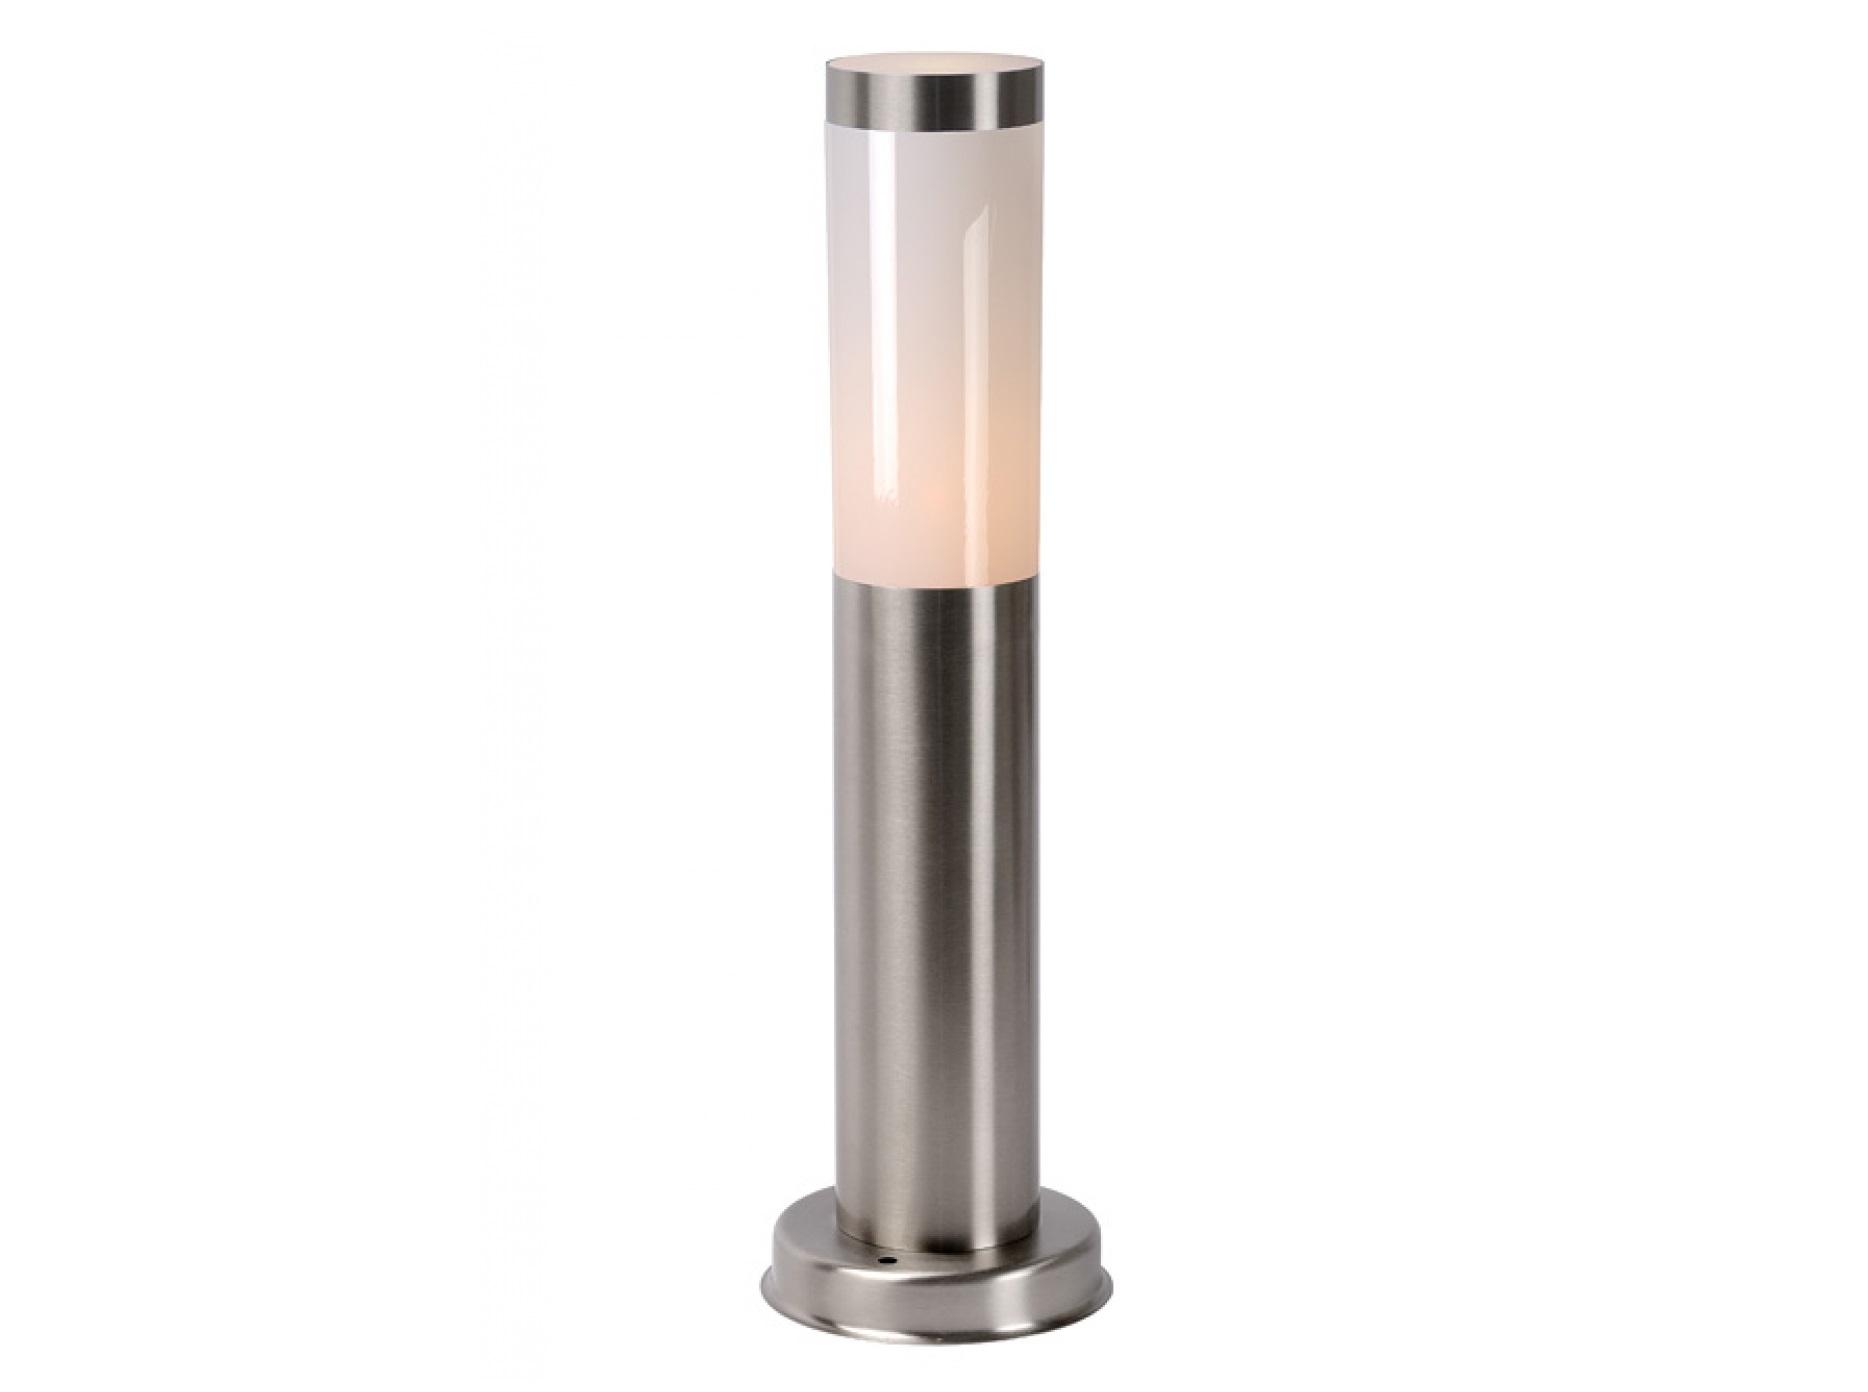 Столб KiboУличные наземные светильники<br>&amp;lt;div&amp;gt;&amp;lt;div&amp;gt;Вид цоколя: E27&amp;lt;/div&amp;gt;&amp;lt;div&amp;gt;Мощность: &amp;amp;nbsp;20W&amp;amp;nbsp;&amp;lt;/div&amp;gt;&amp;lt;div&amp;gt;Количество ламп: 1 (нет в комплекте)&amp;lt;/div&amp;gt;&amp;lt;/div&amp;gt;<br><br>Material: Металл<br>Length см: None<br>Width см: None<br>Depth см: None<br>Height см: 45.5<br>Diameter см: 7.5